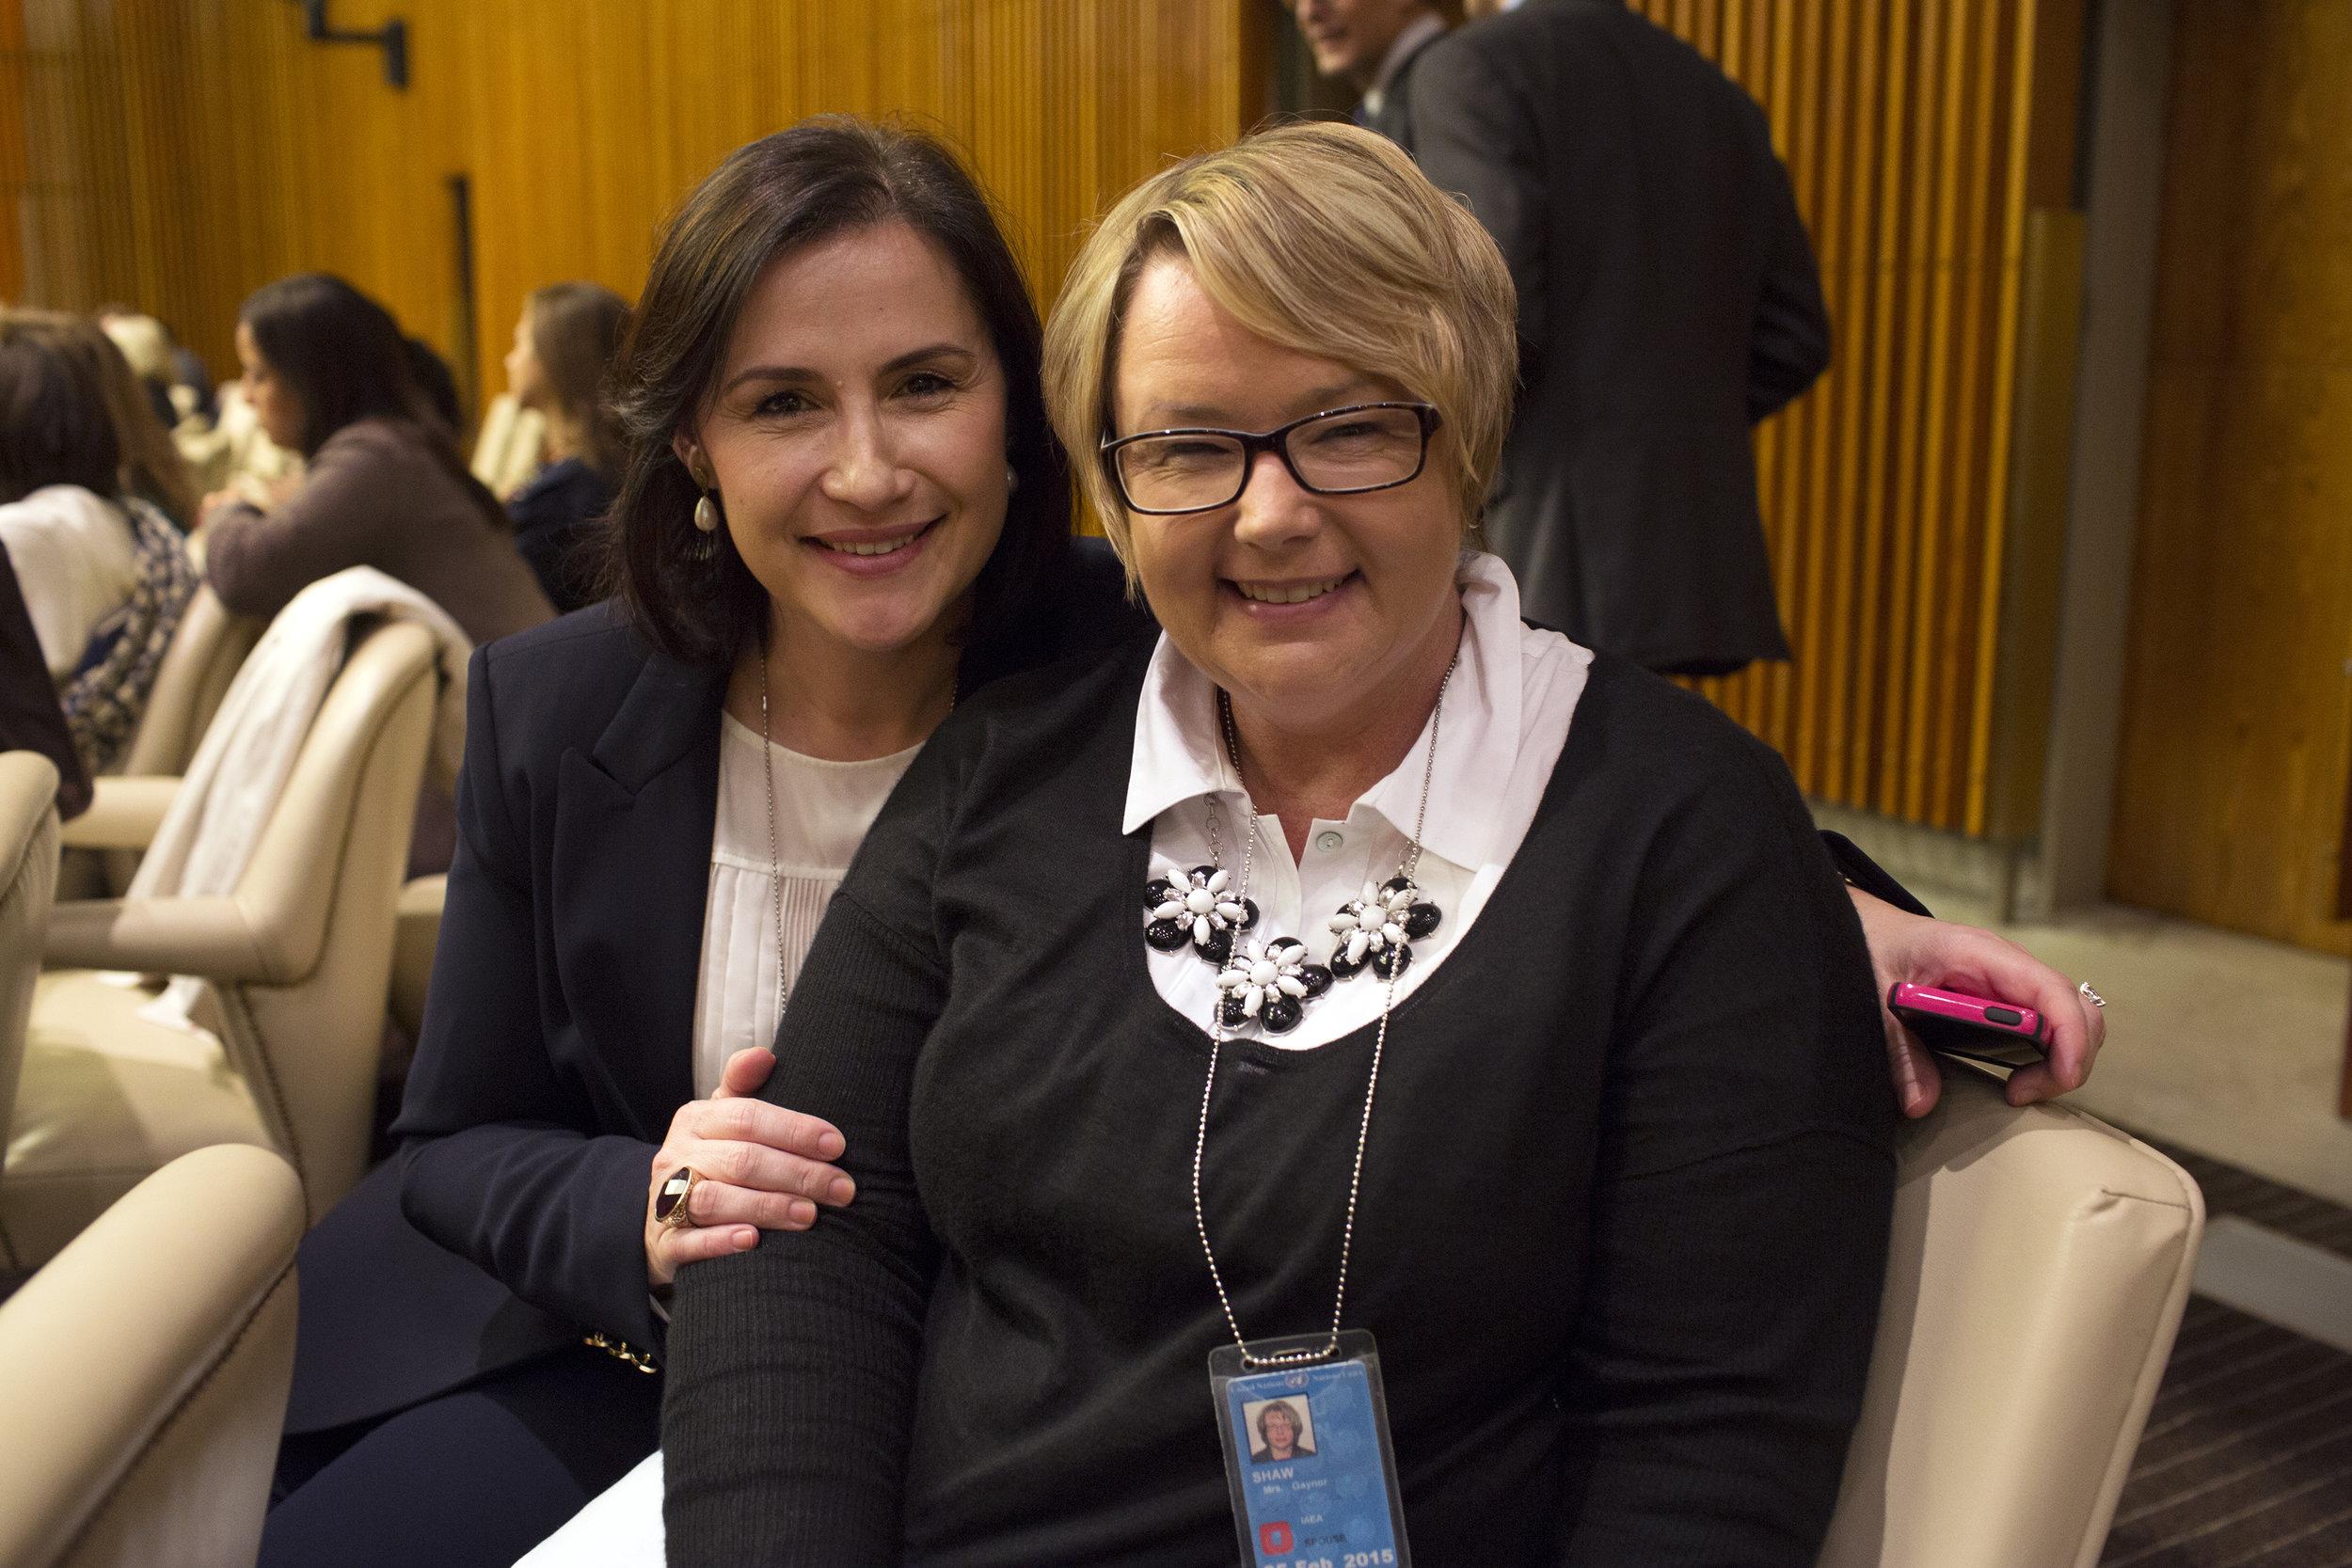 Gaynor Shaw (left) and Valbona Neritani .JPG